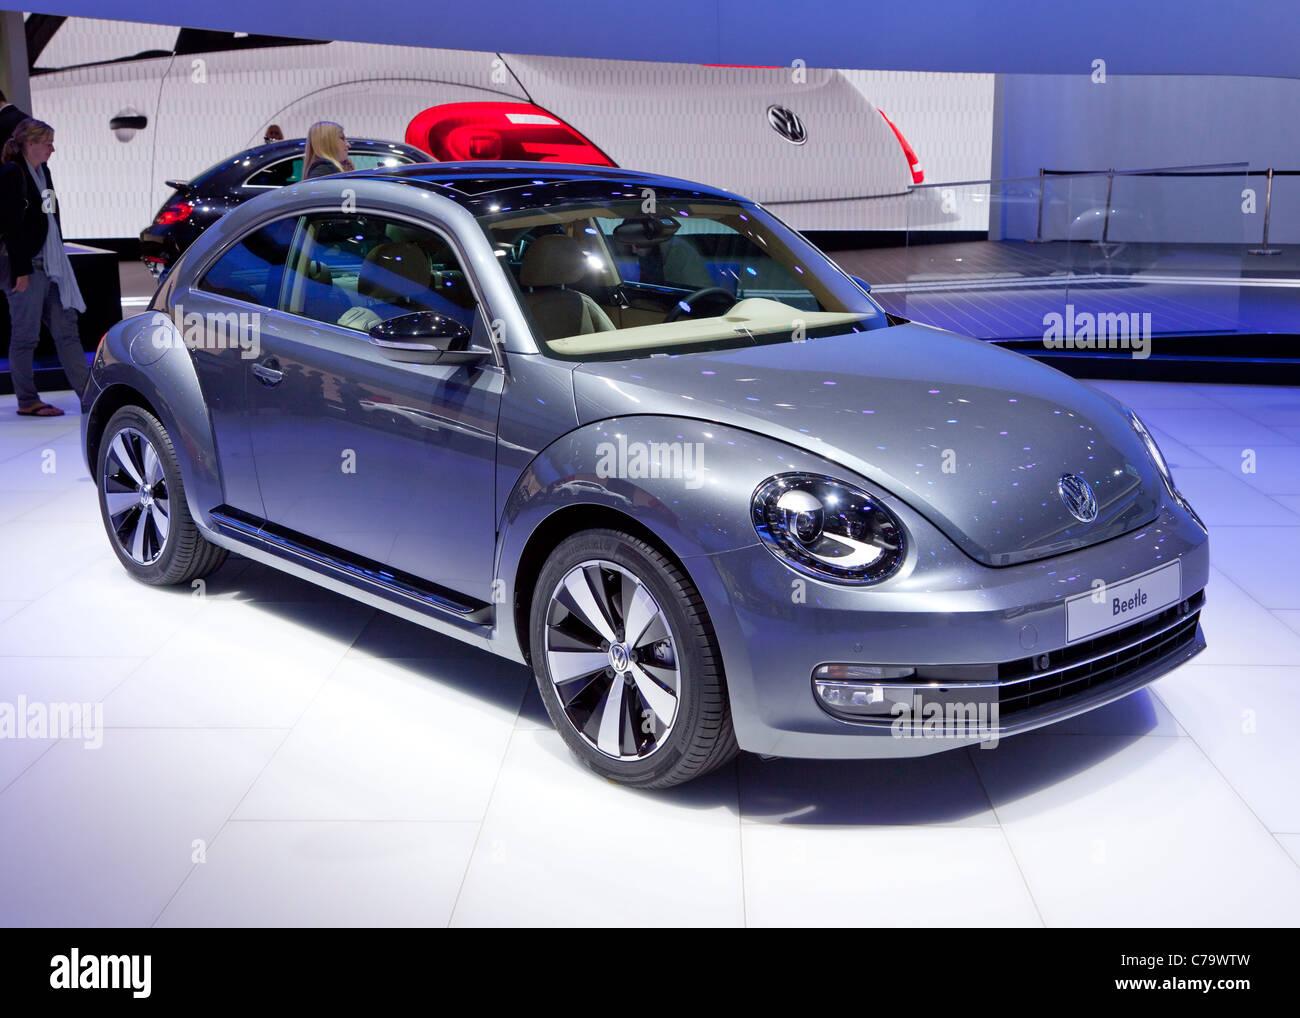 New VW Volkswagen Beetle on the IAA 2011 International Motor Show in Frankfurt am Main, Germany - Stock Image